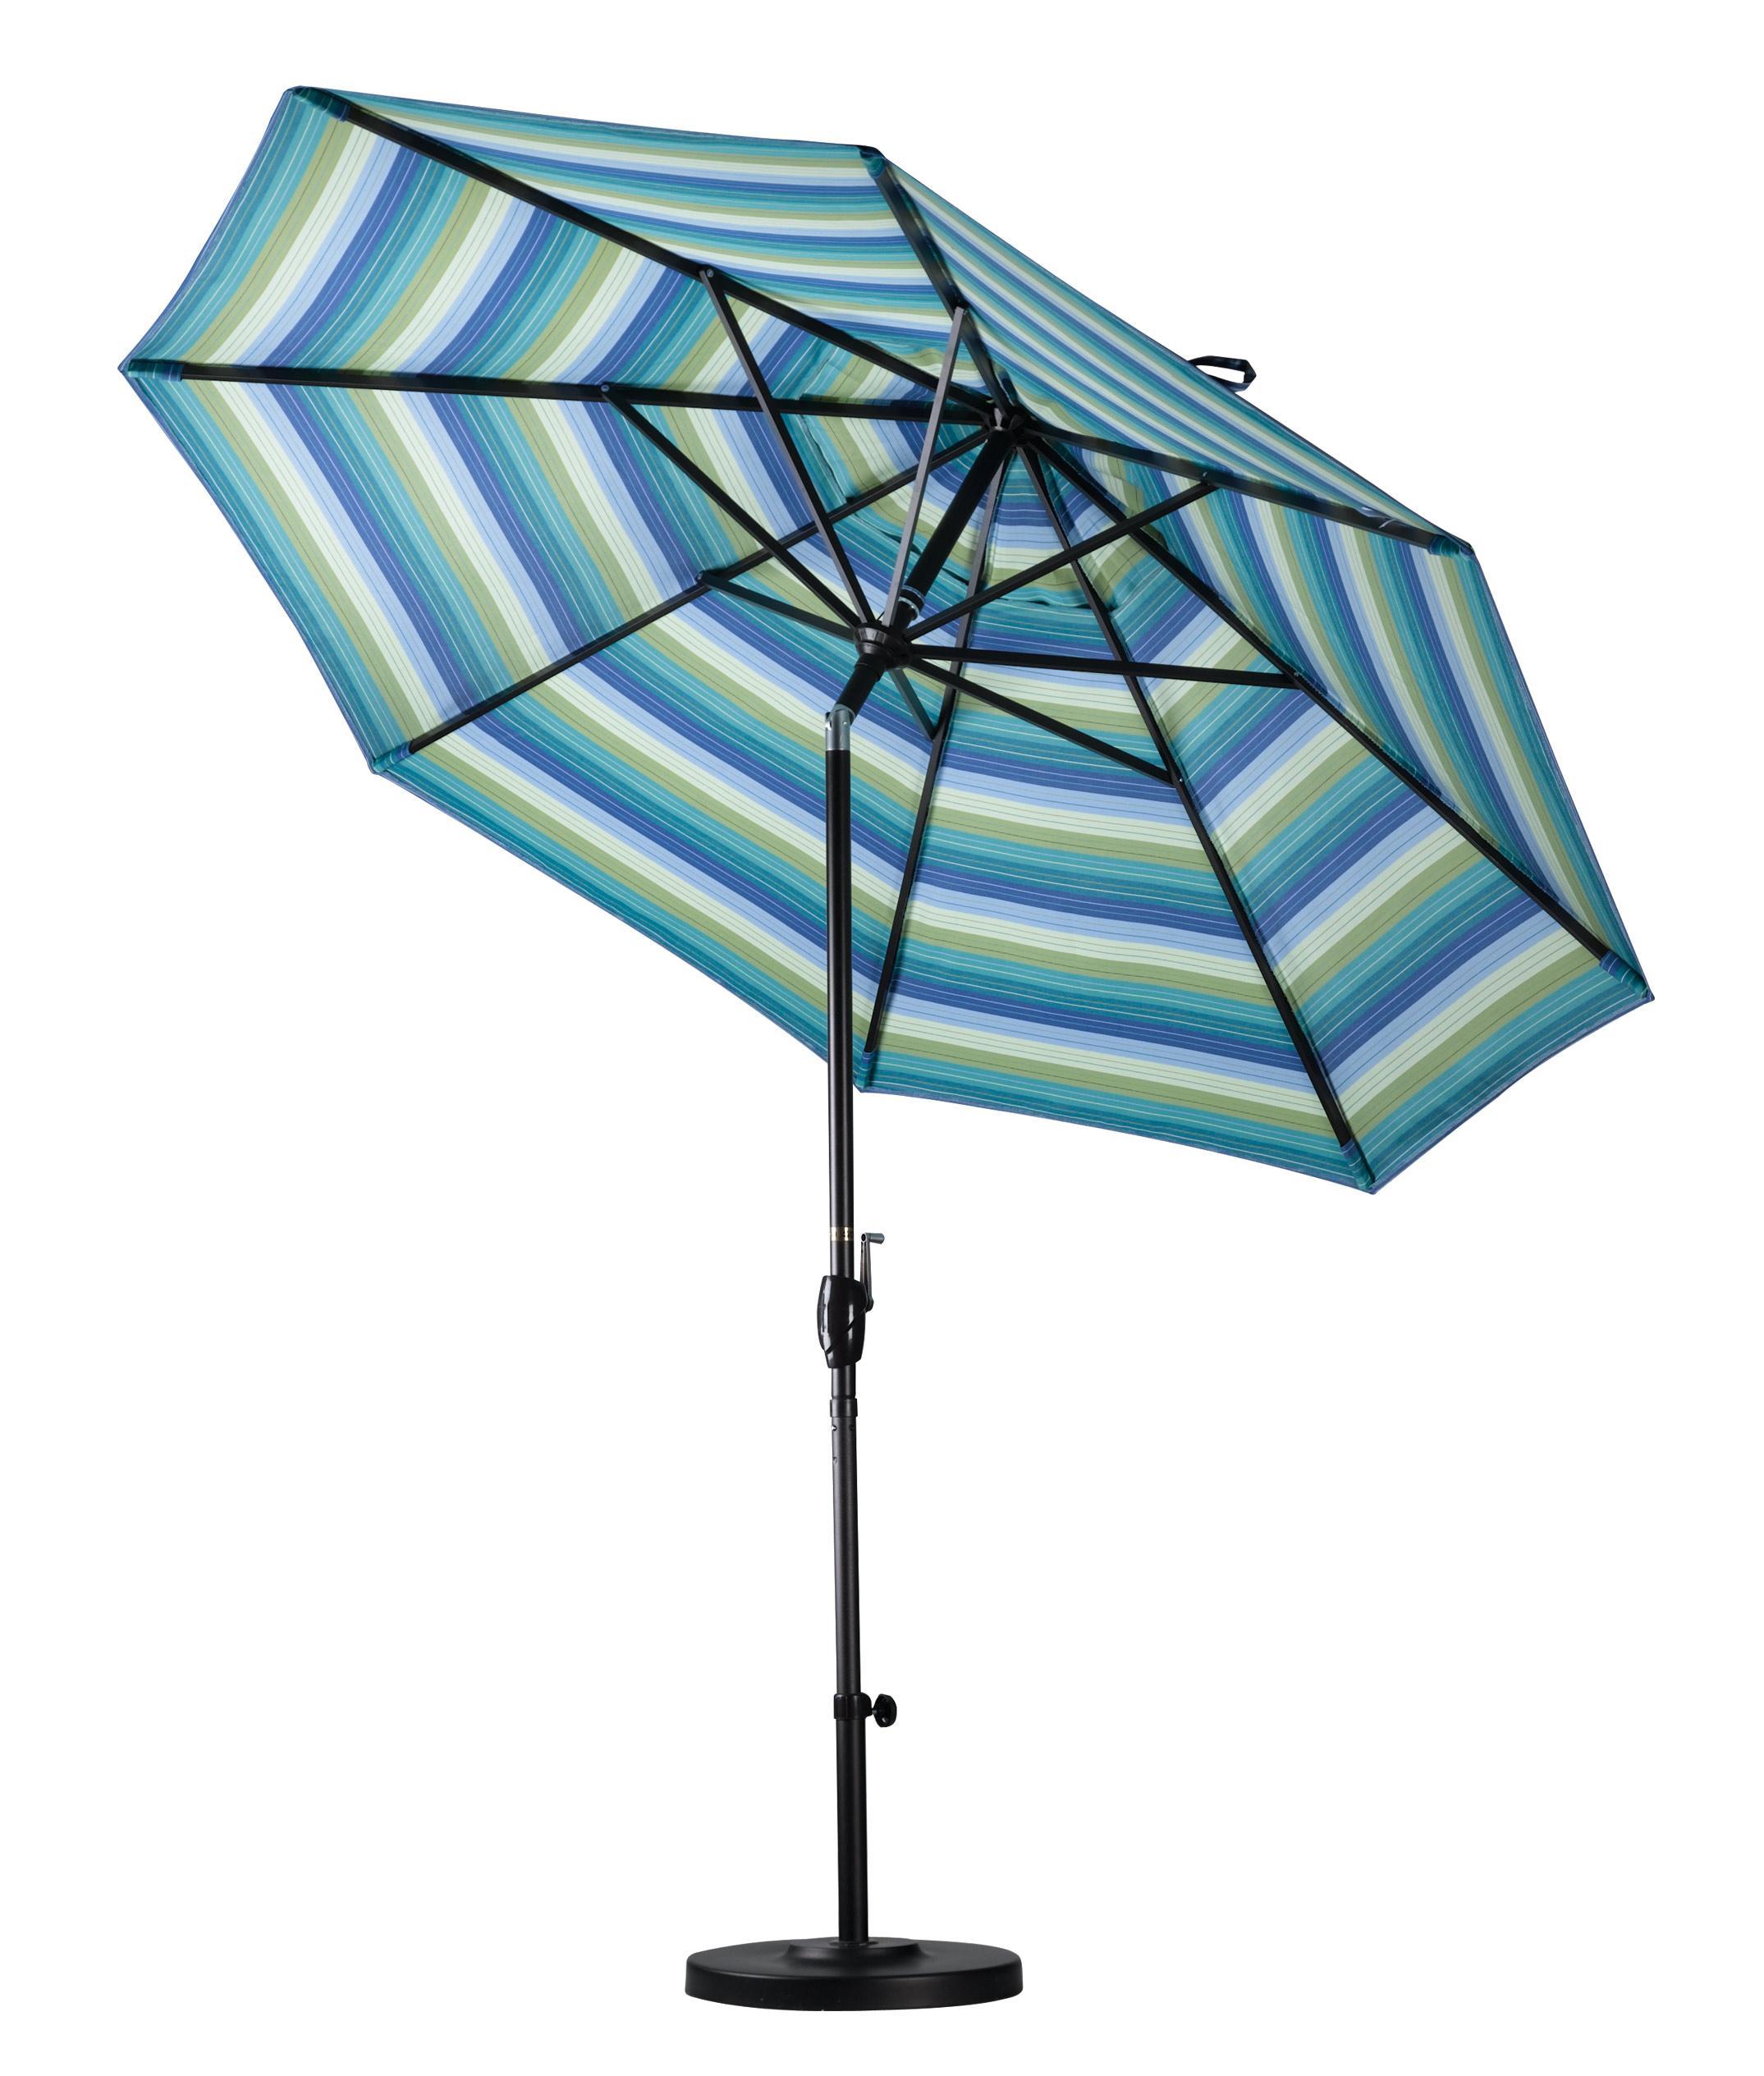 California umbrella 9 feet olefin fabric for Outdoor patio umbrellas